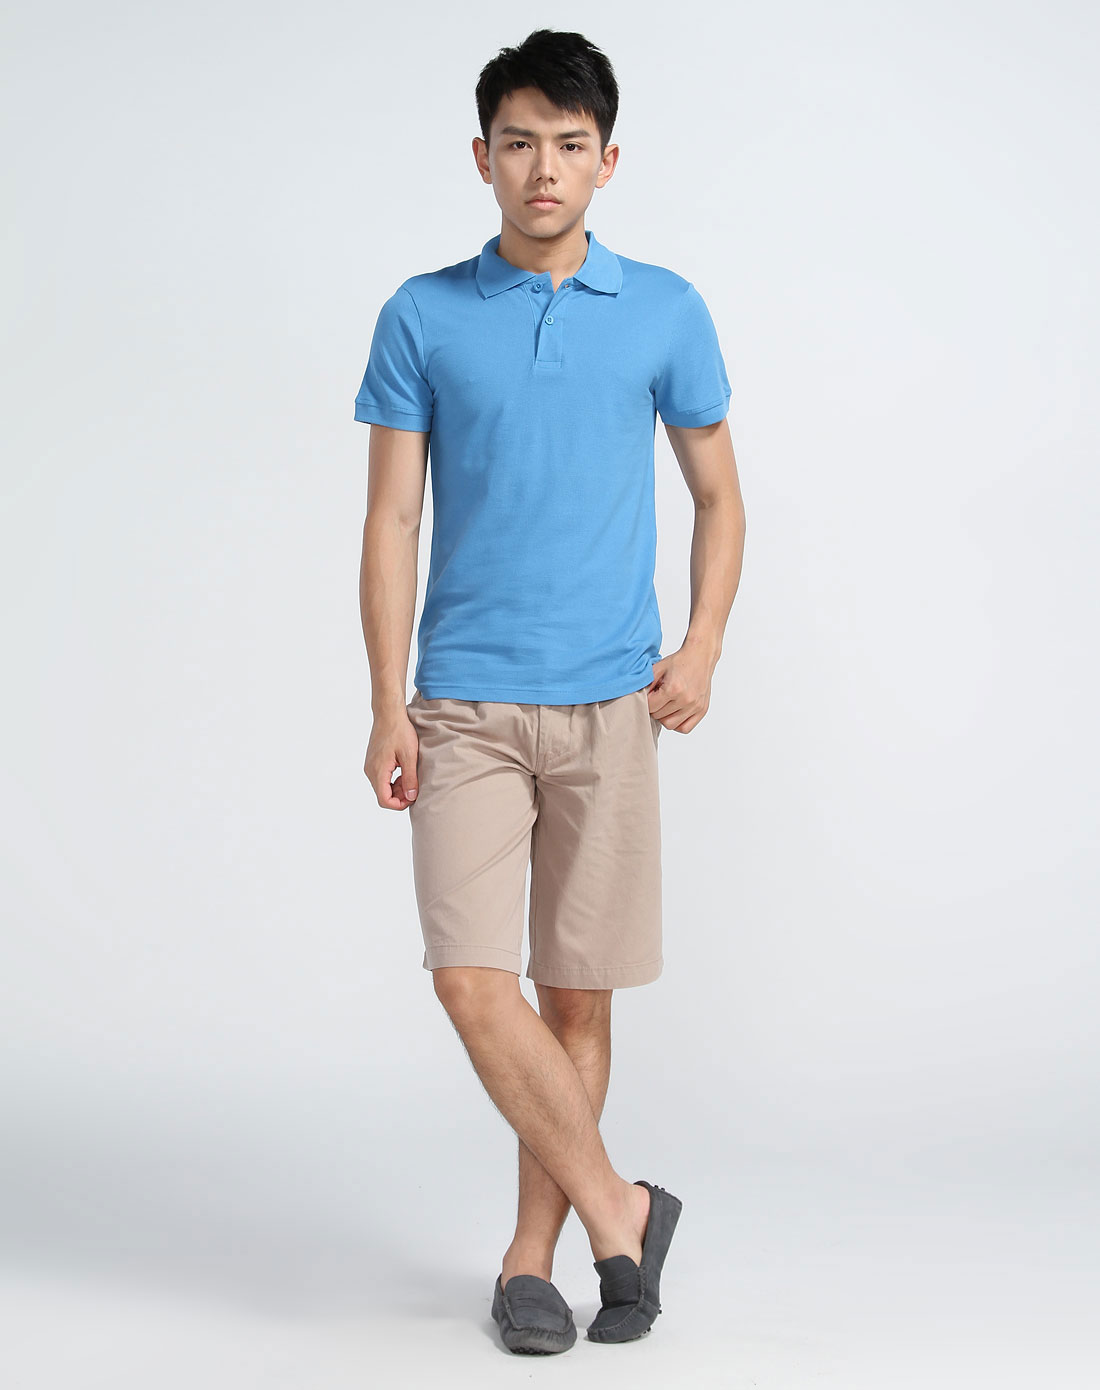 redoute纯色蓝色短袖polo衫yc430-44